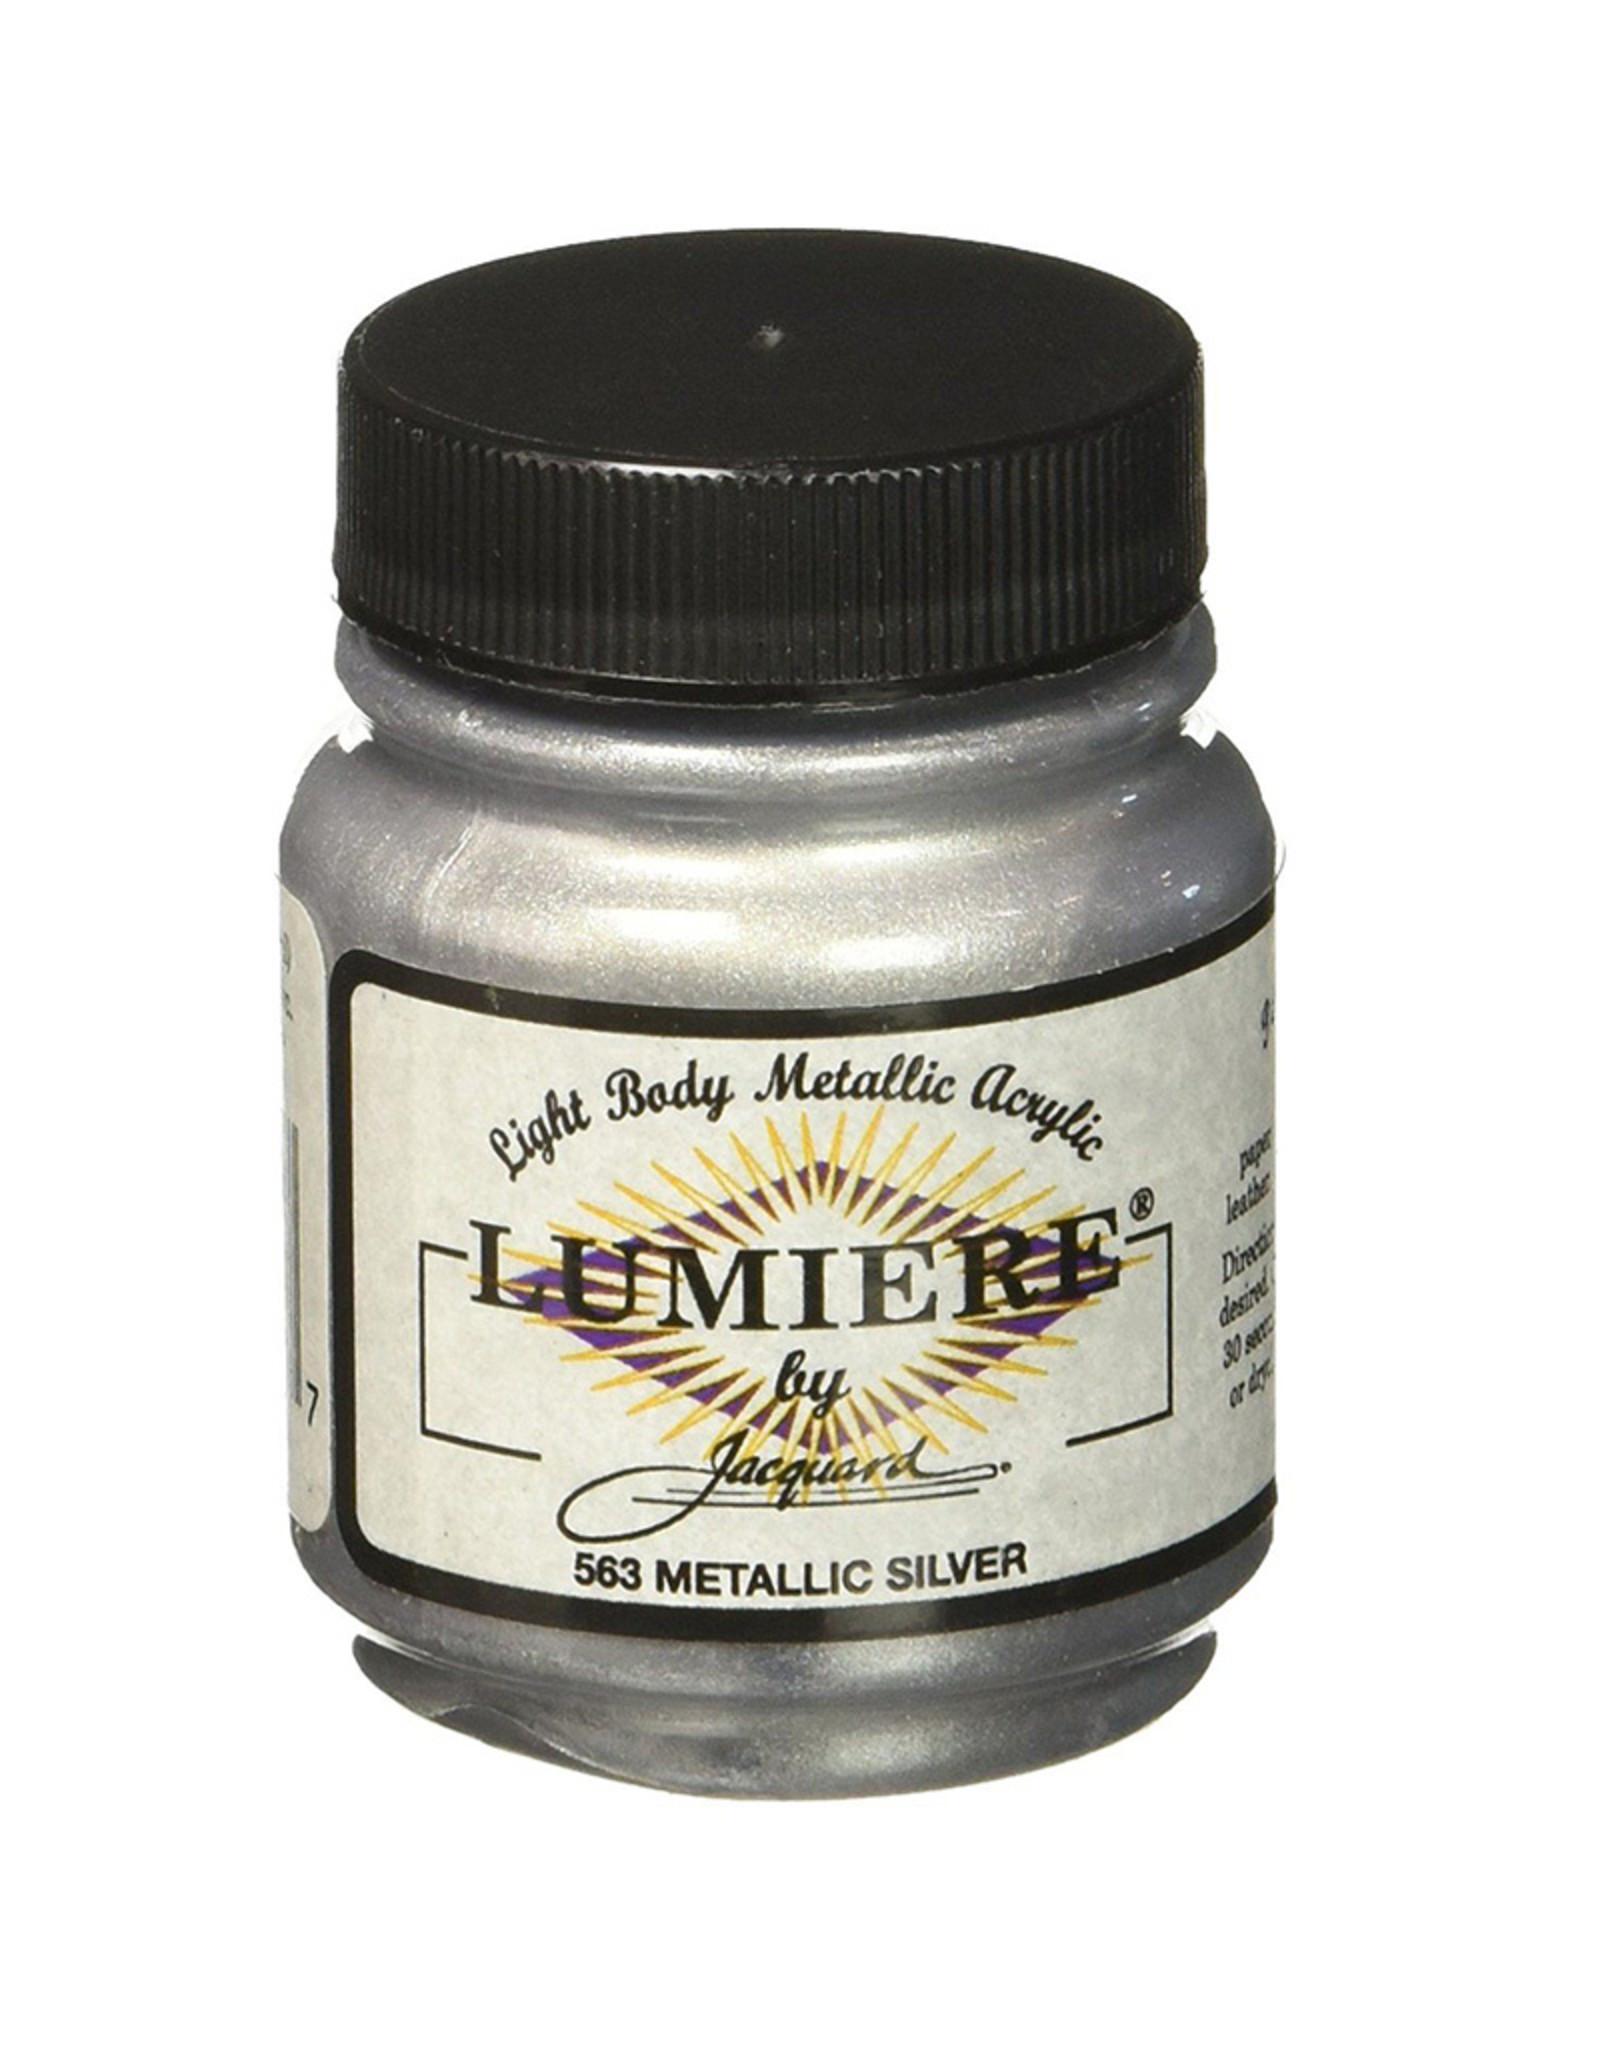 Jacquard Lumiere Metallic Silver